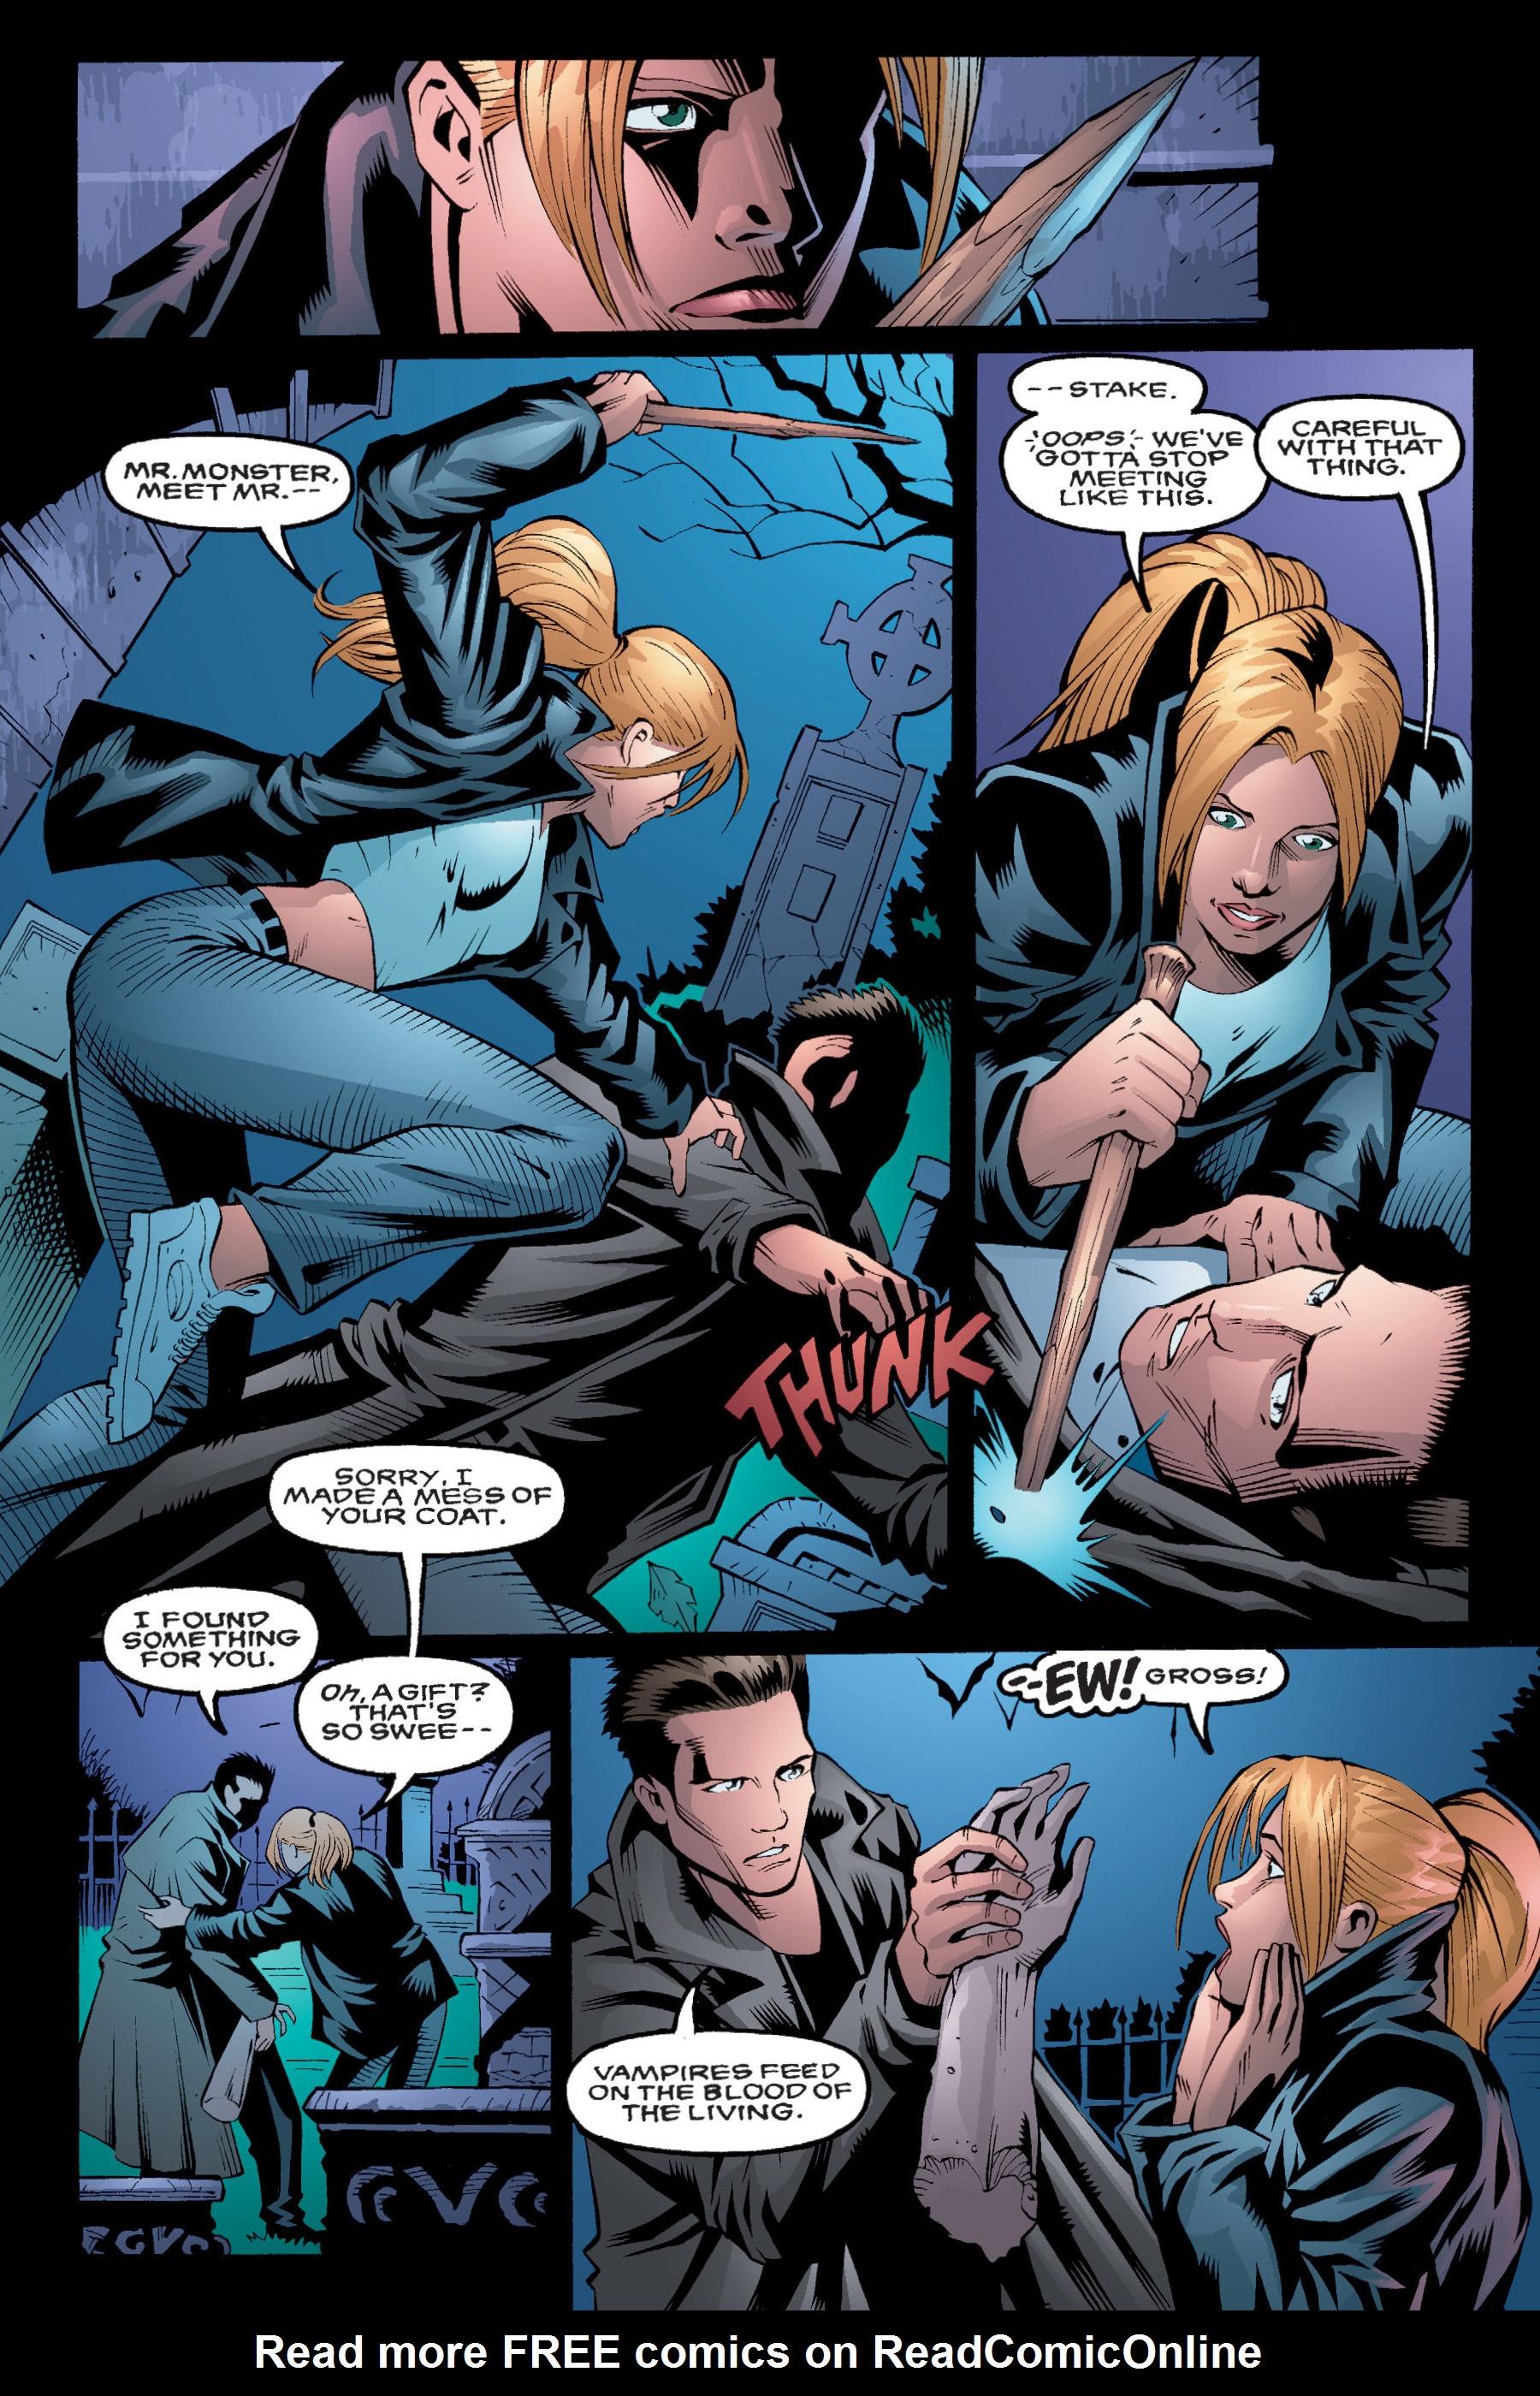 Read online Buffy the Vampire Slayer: Omnibus comic -  Issue # TPB 4 - 12